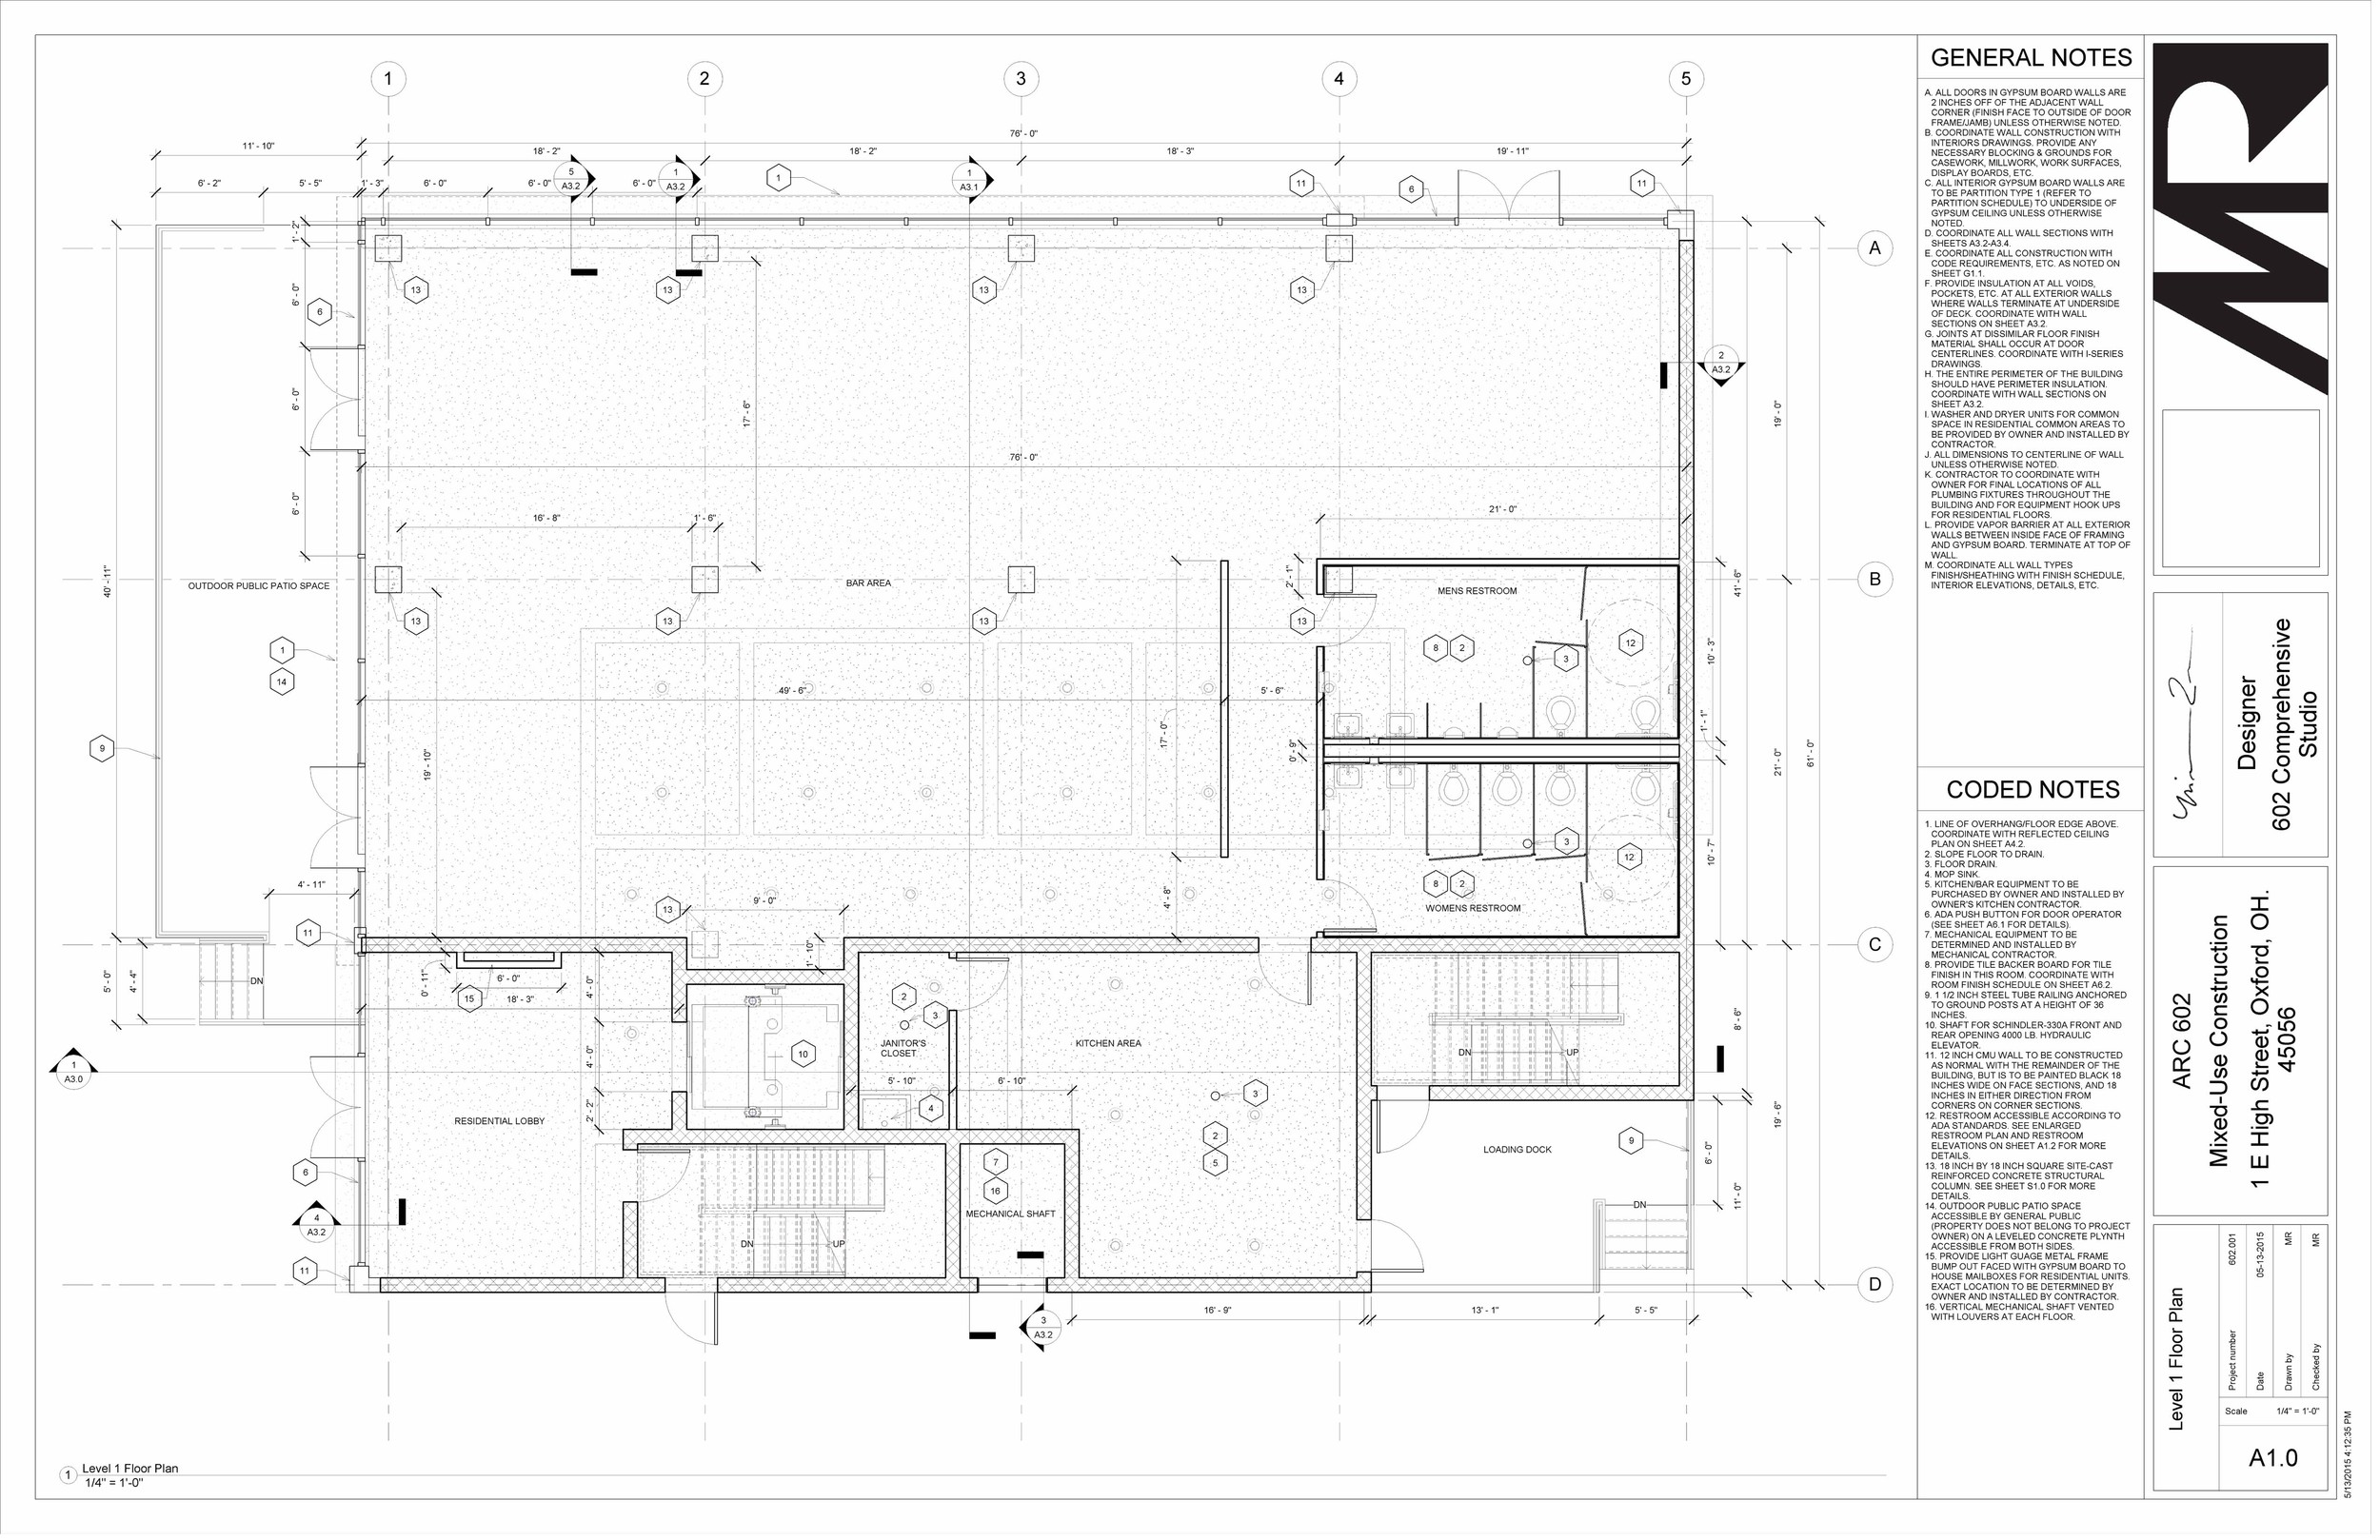 602 Studio - Sheet - A1-0 - Level 1 Floor Plan copy.jpg